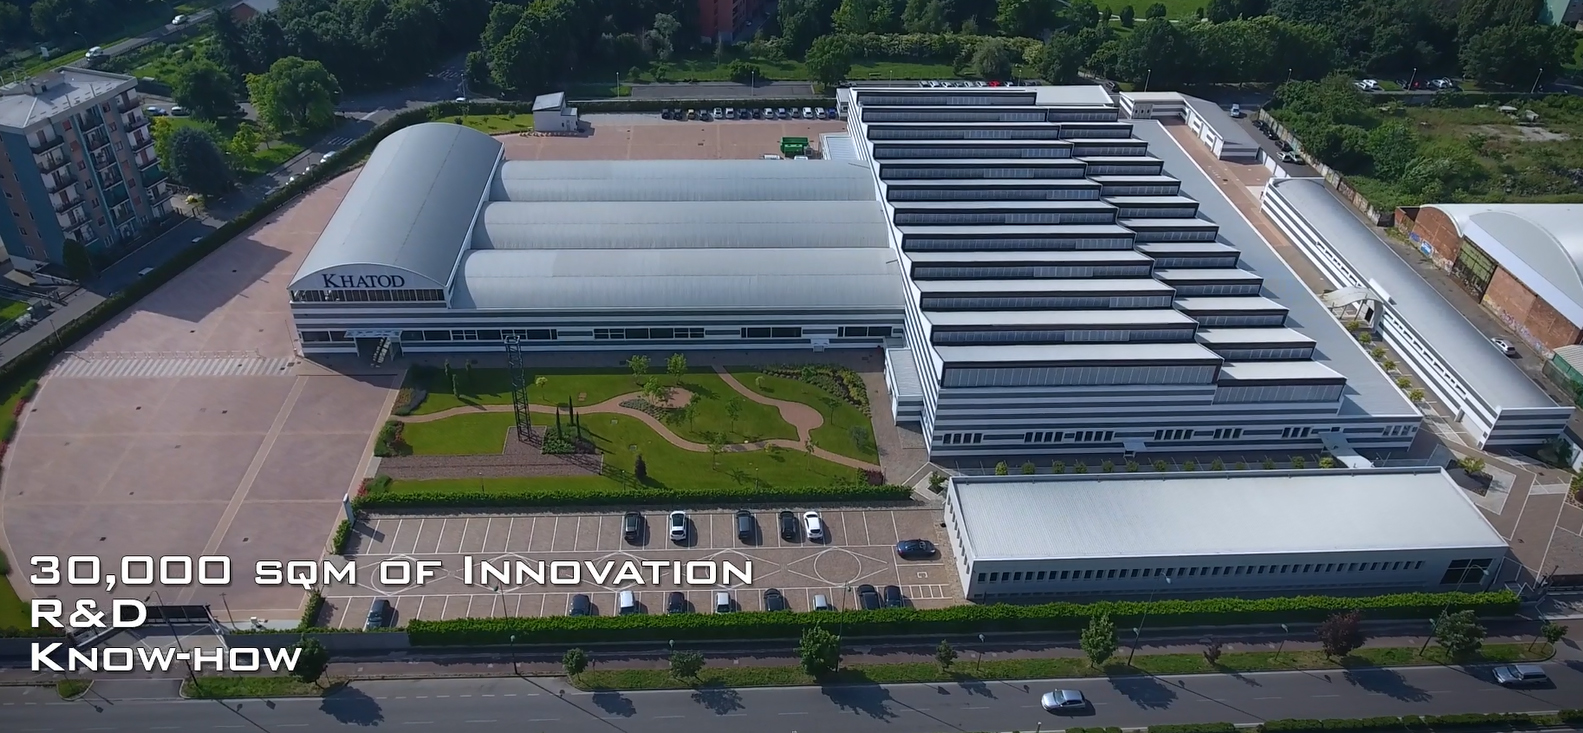 Khatod光电元件有限公司 – 源自 1985年 - 我们是解决方案的制造专家